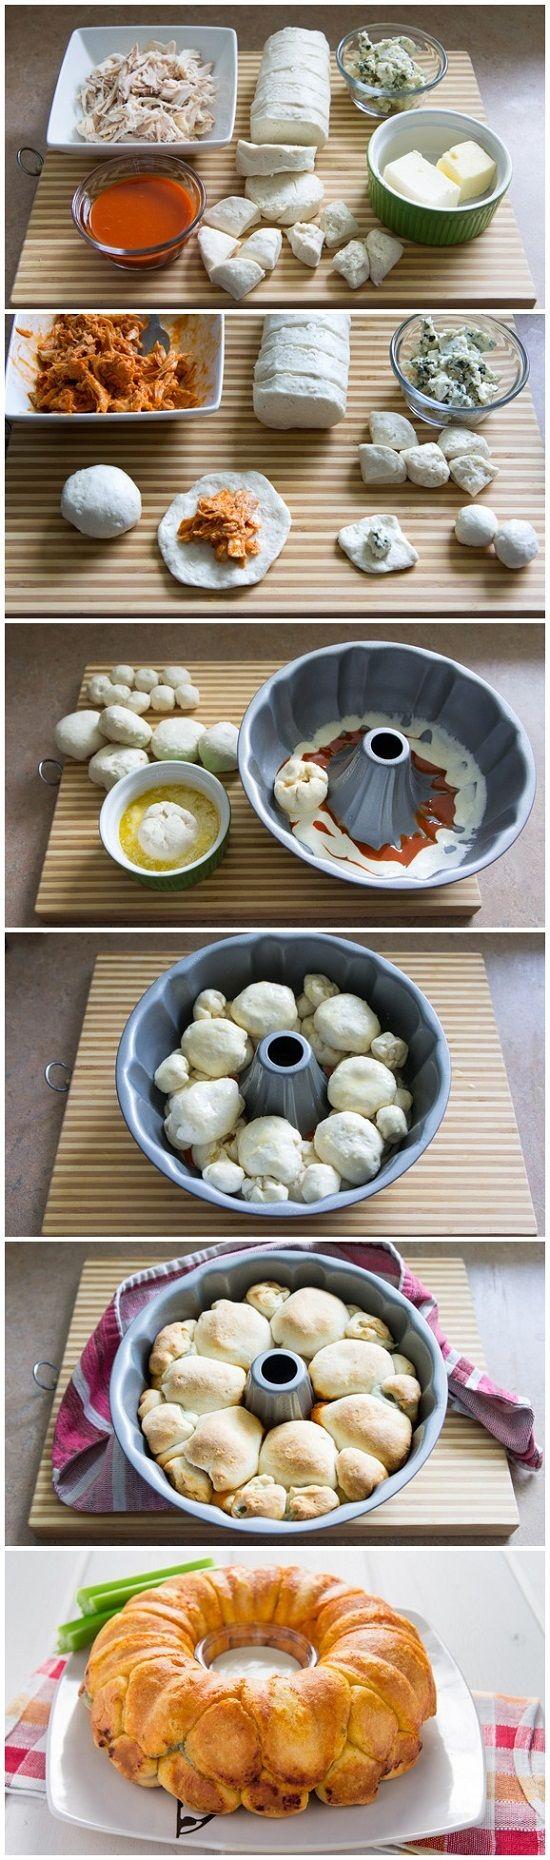 How to make delicious buffalo chicken monkey bread